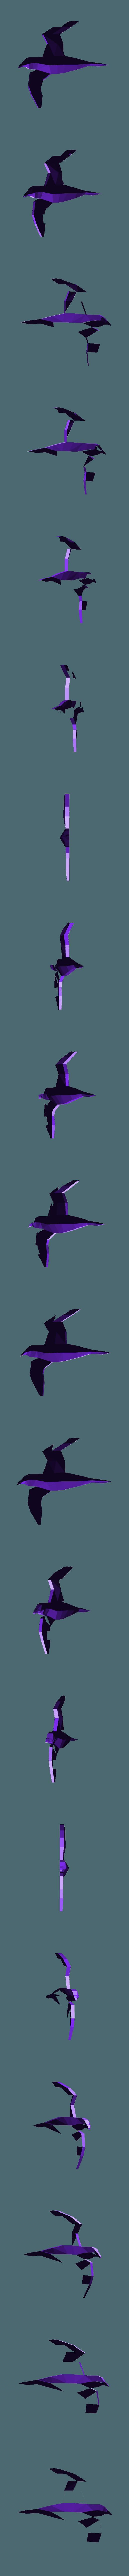 SeaBird.stl Download free STL file Marine Life Wall Project • 3D printer template, Double_Alfa_3D